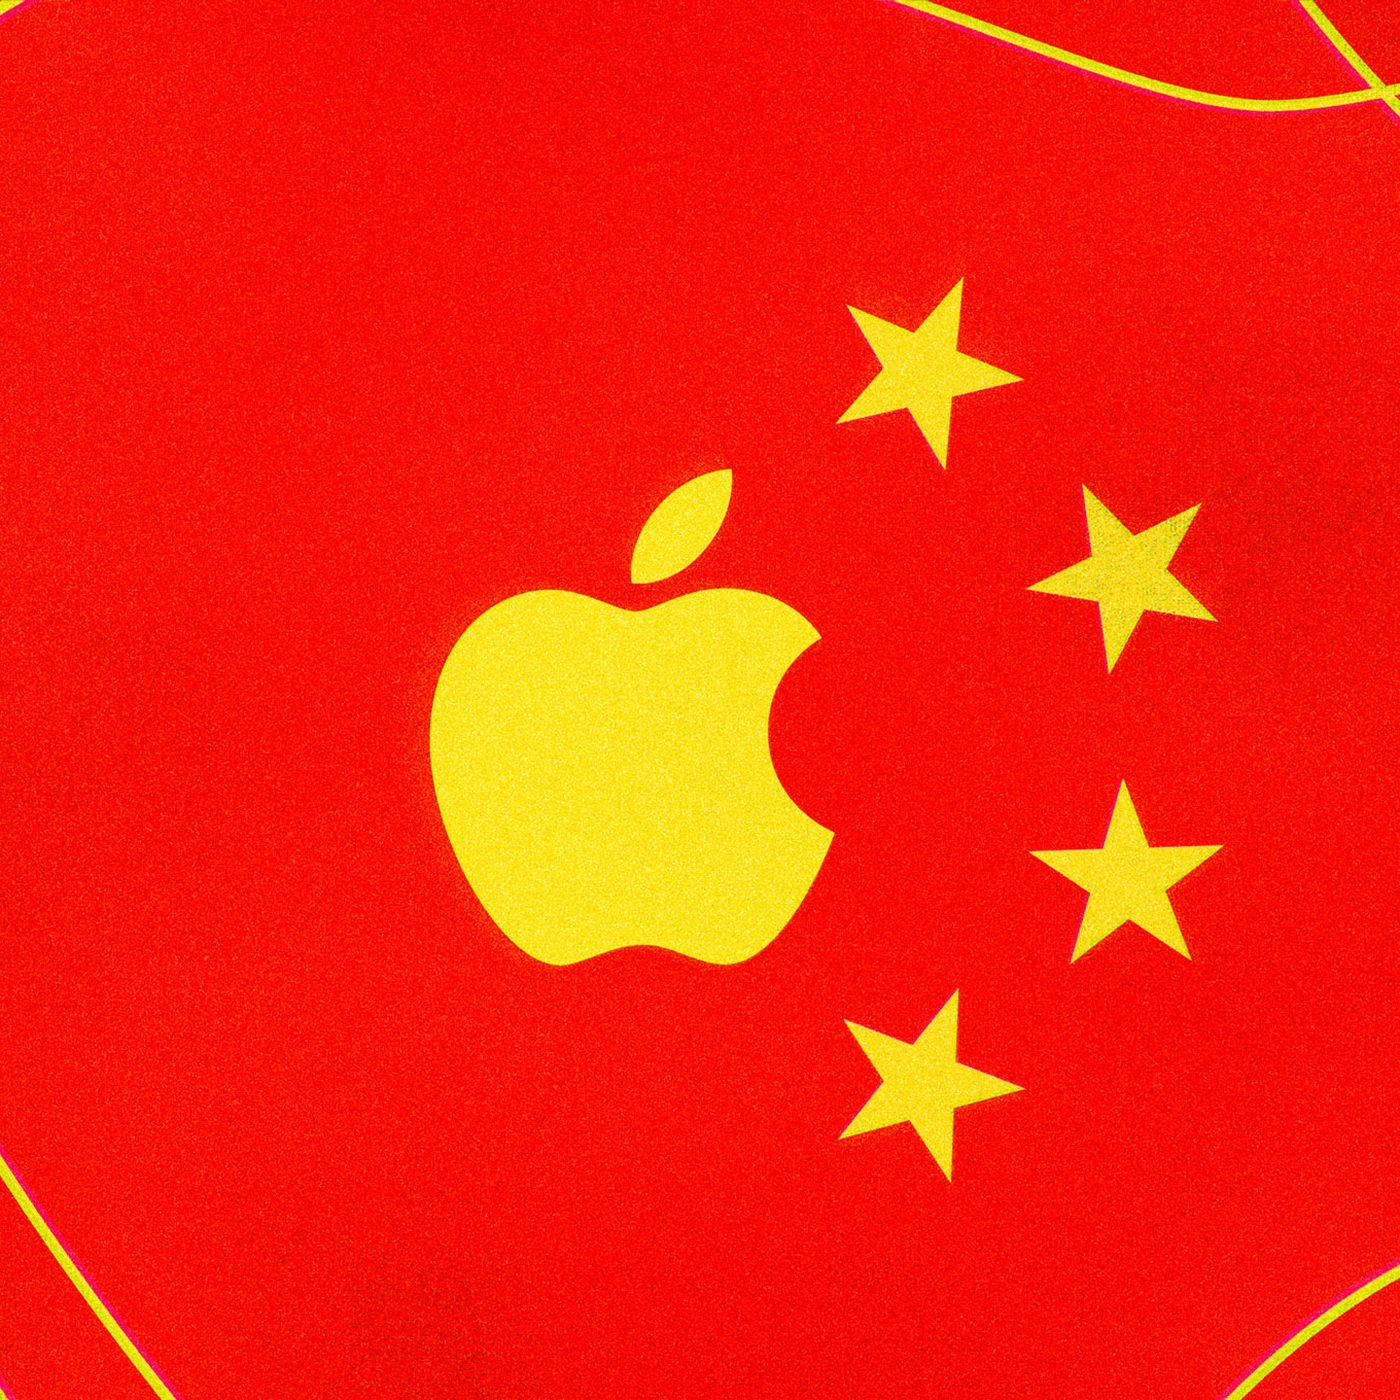 theverge.com - Nick Statt - Apple's iCloud partner in China will store user data on servers of state-run telecom